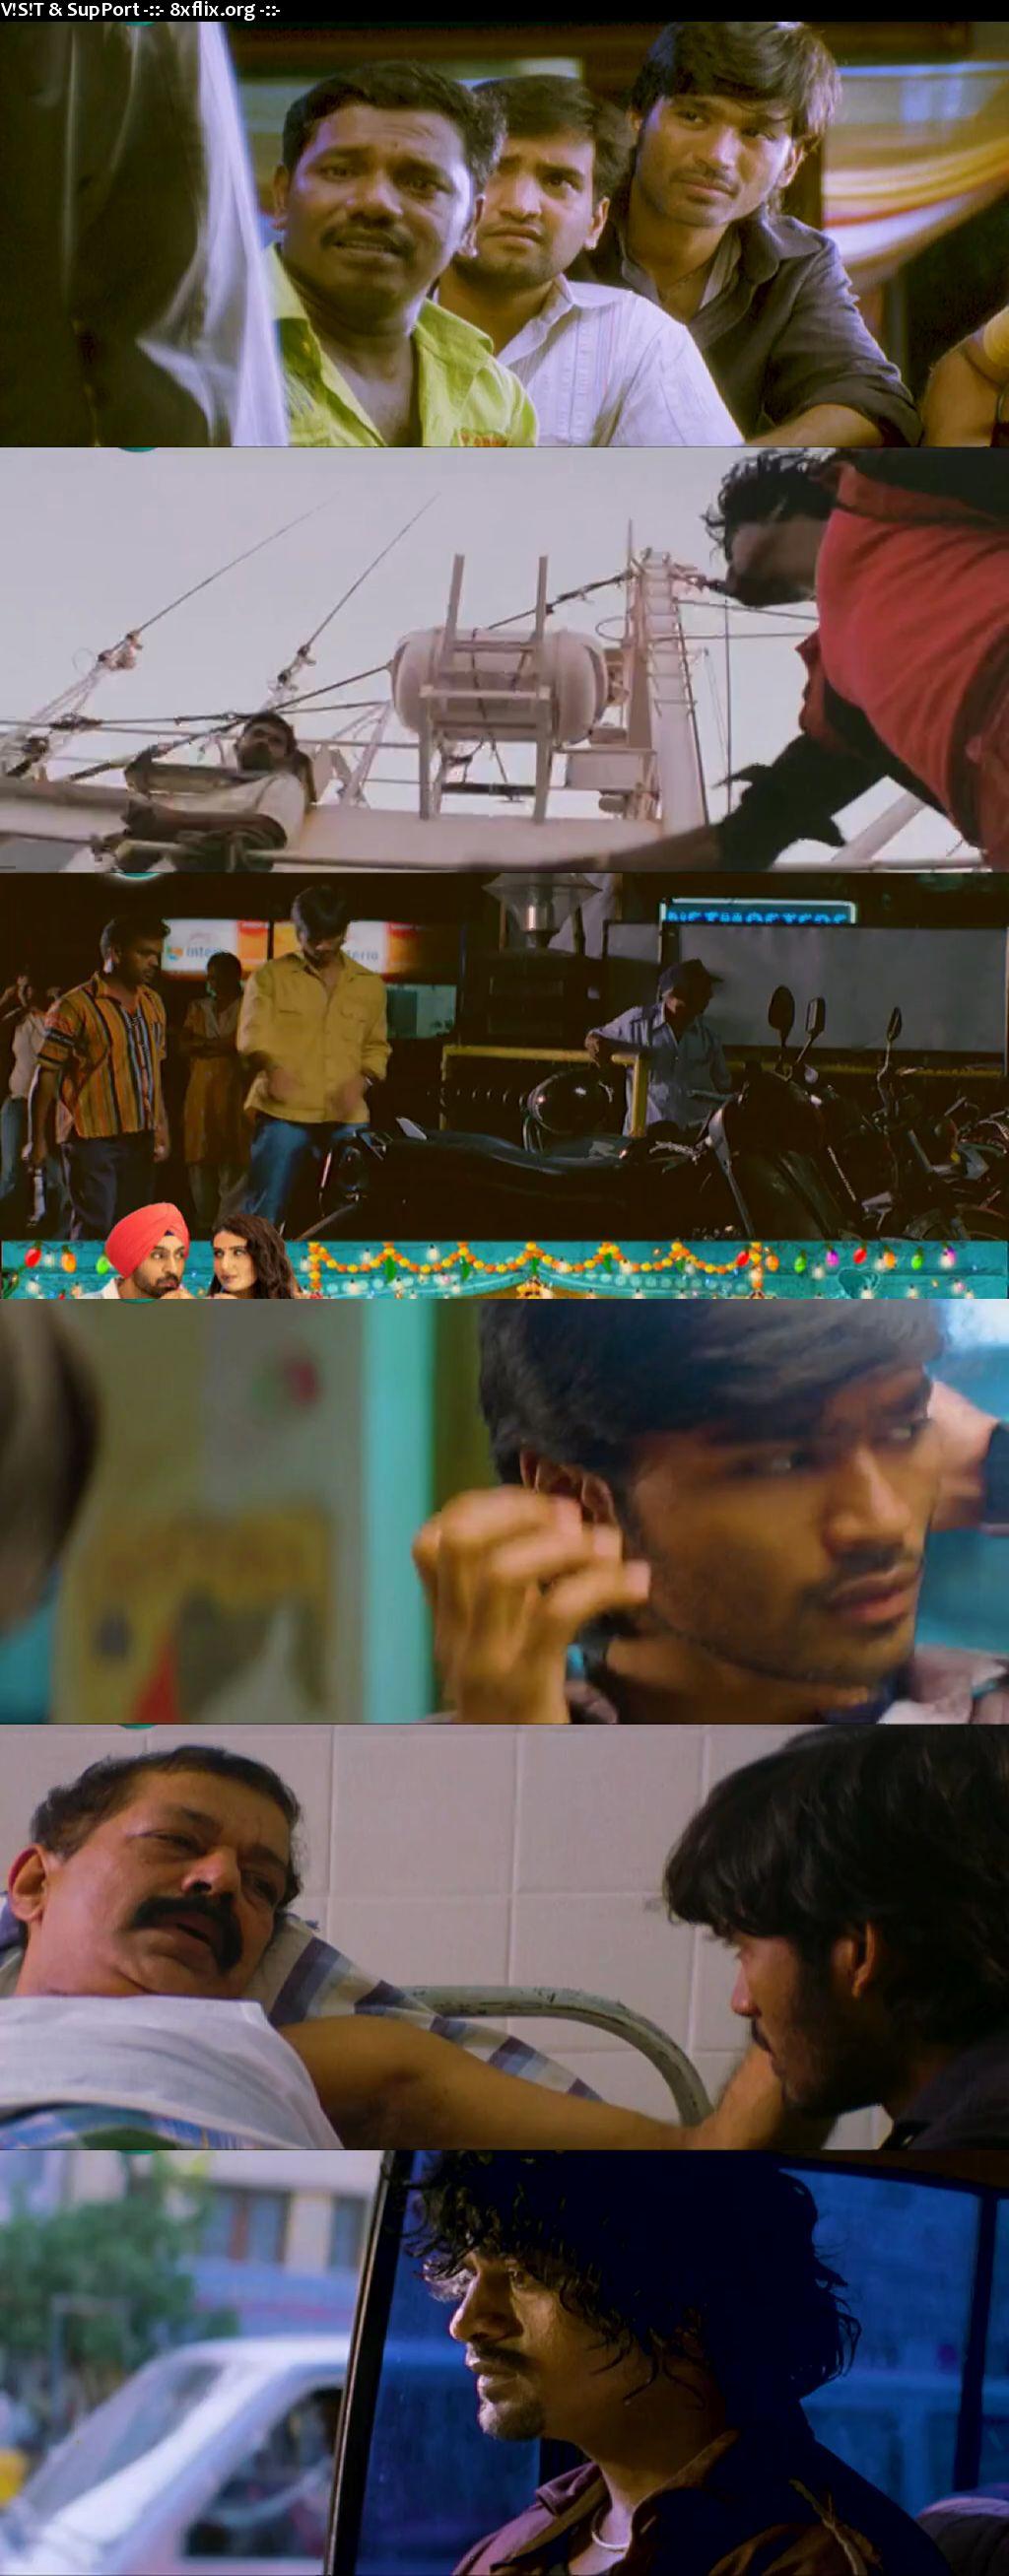 Polladhavan 2007 Full Movie Hindi Dubbed 720p 480p HDTV